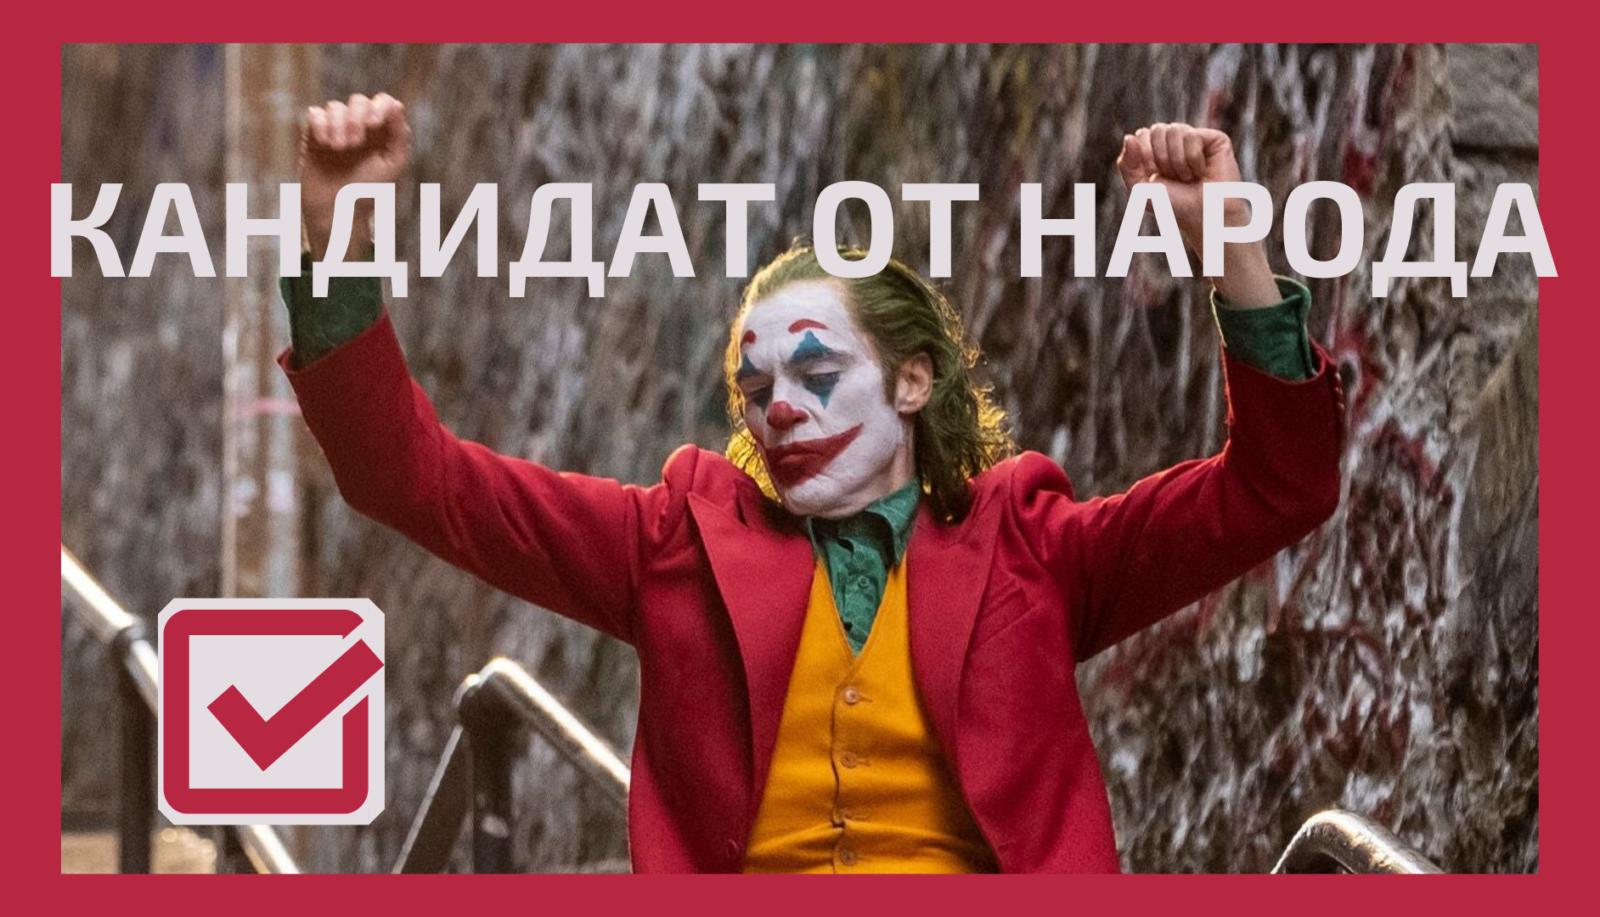 Джокер - кандидат от народа